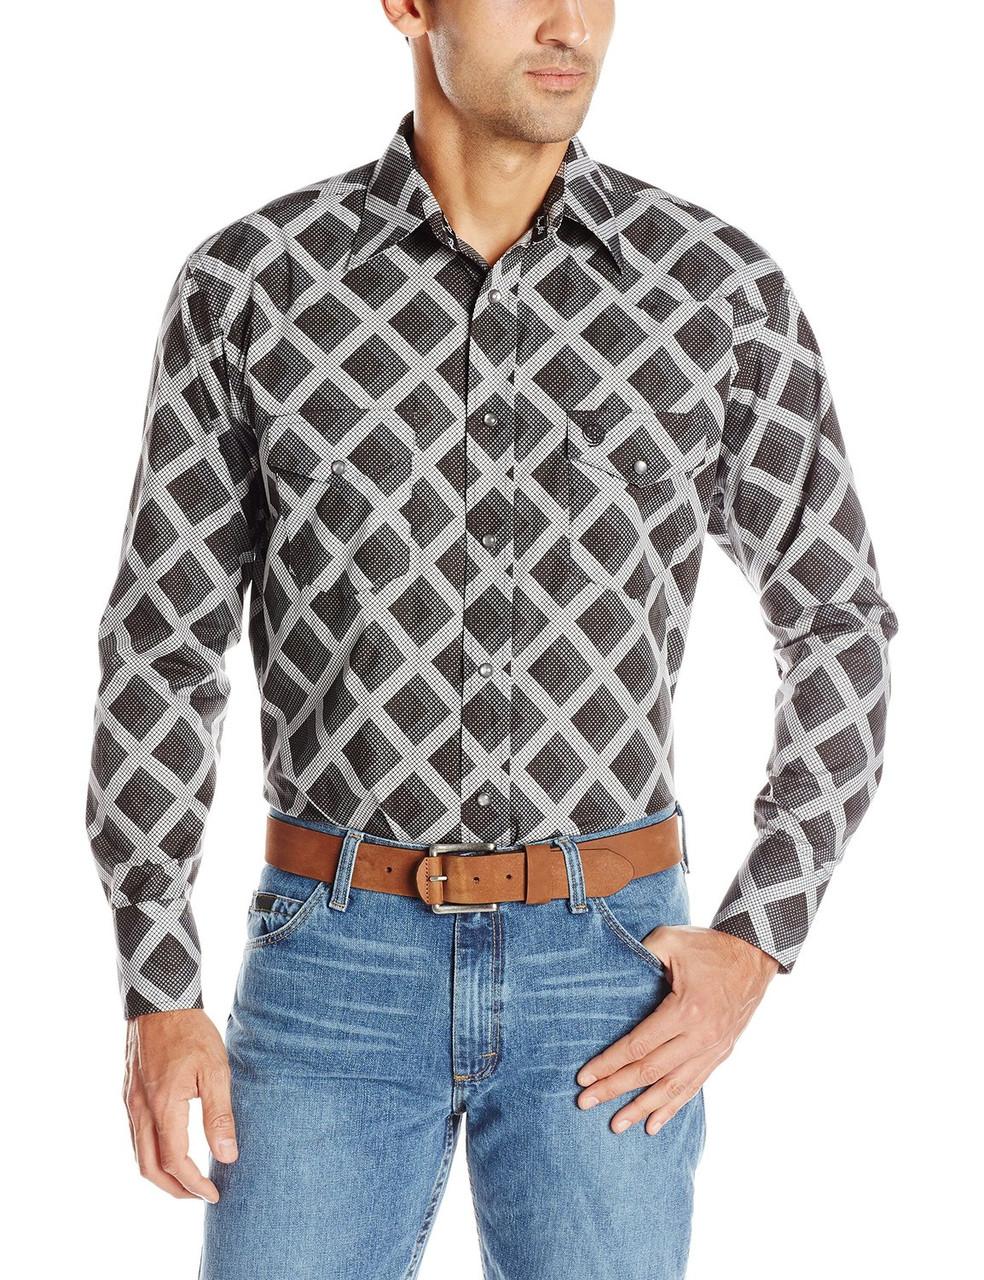 Рубашка Wrangler George Strait, L, Blackberry/Grey, MGSX198